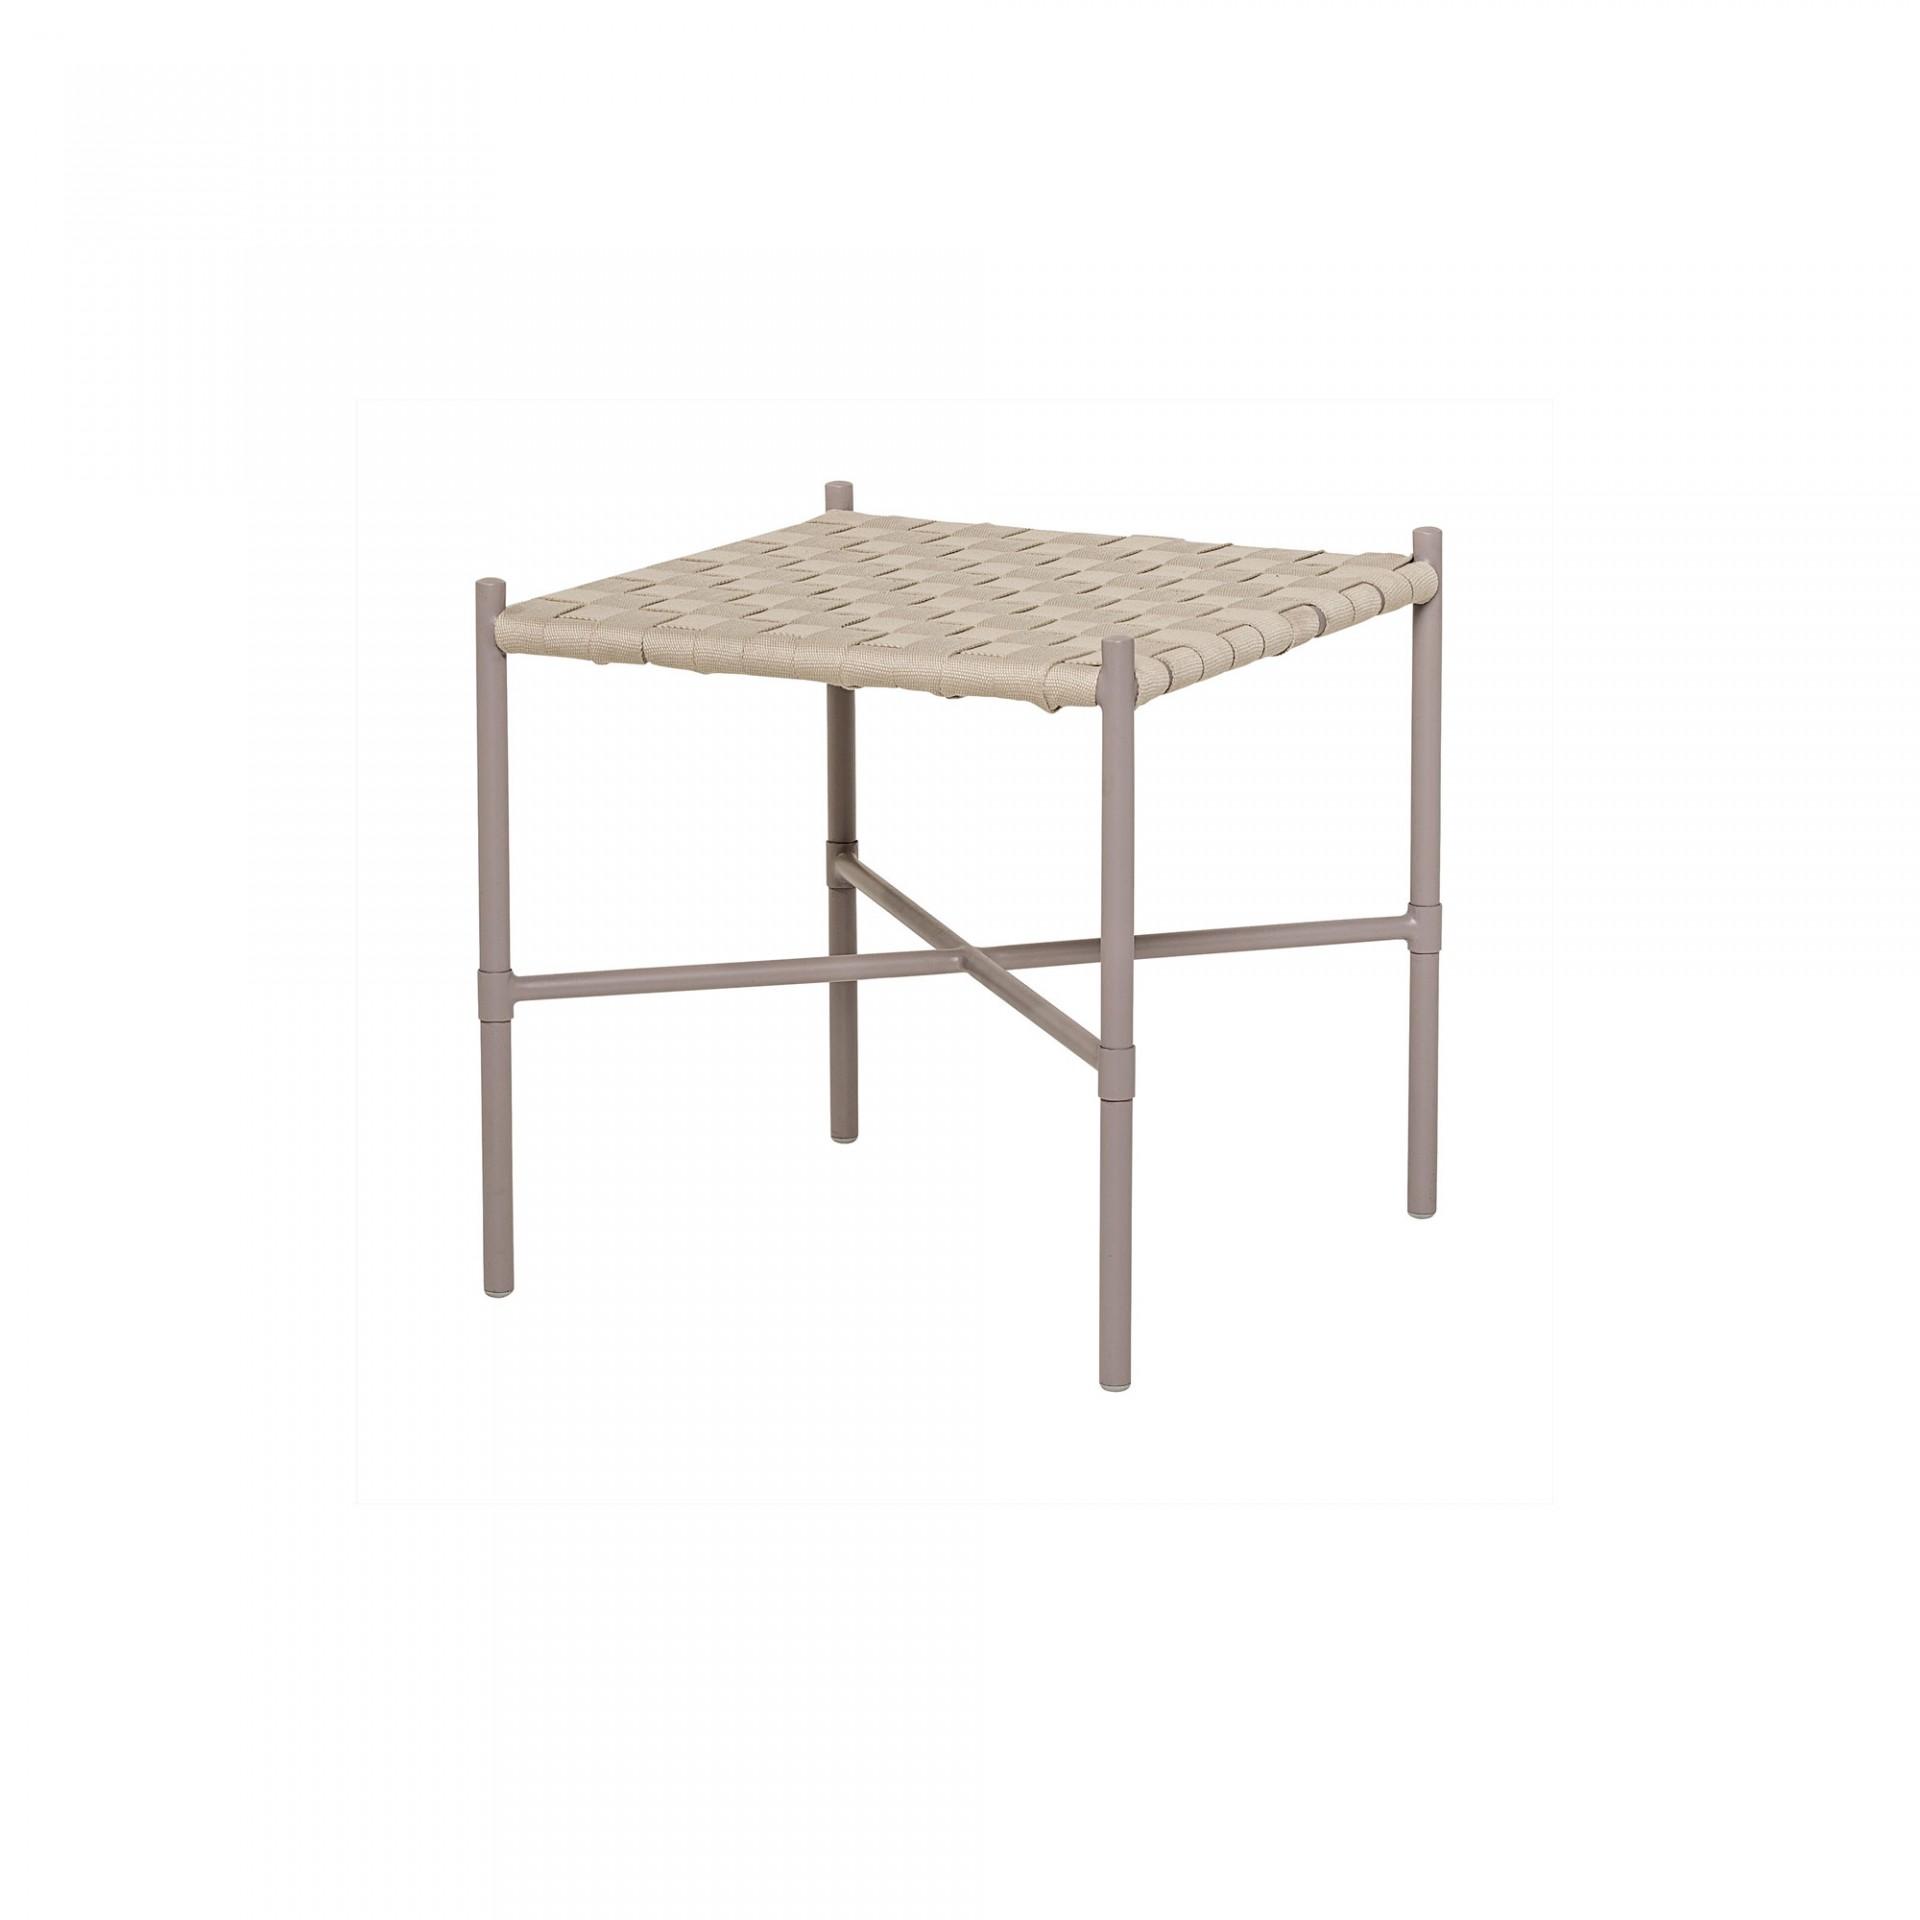 Tamborete Cross, algodão/metal, 45x45x45